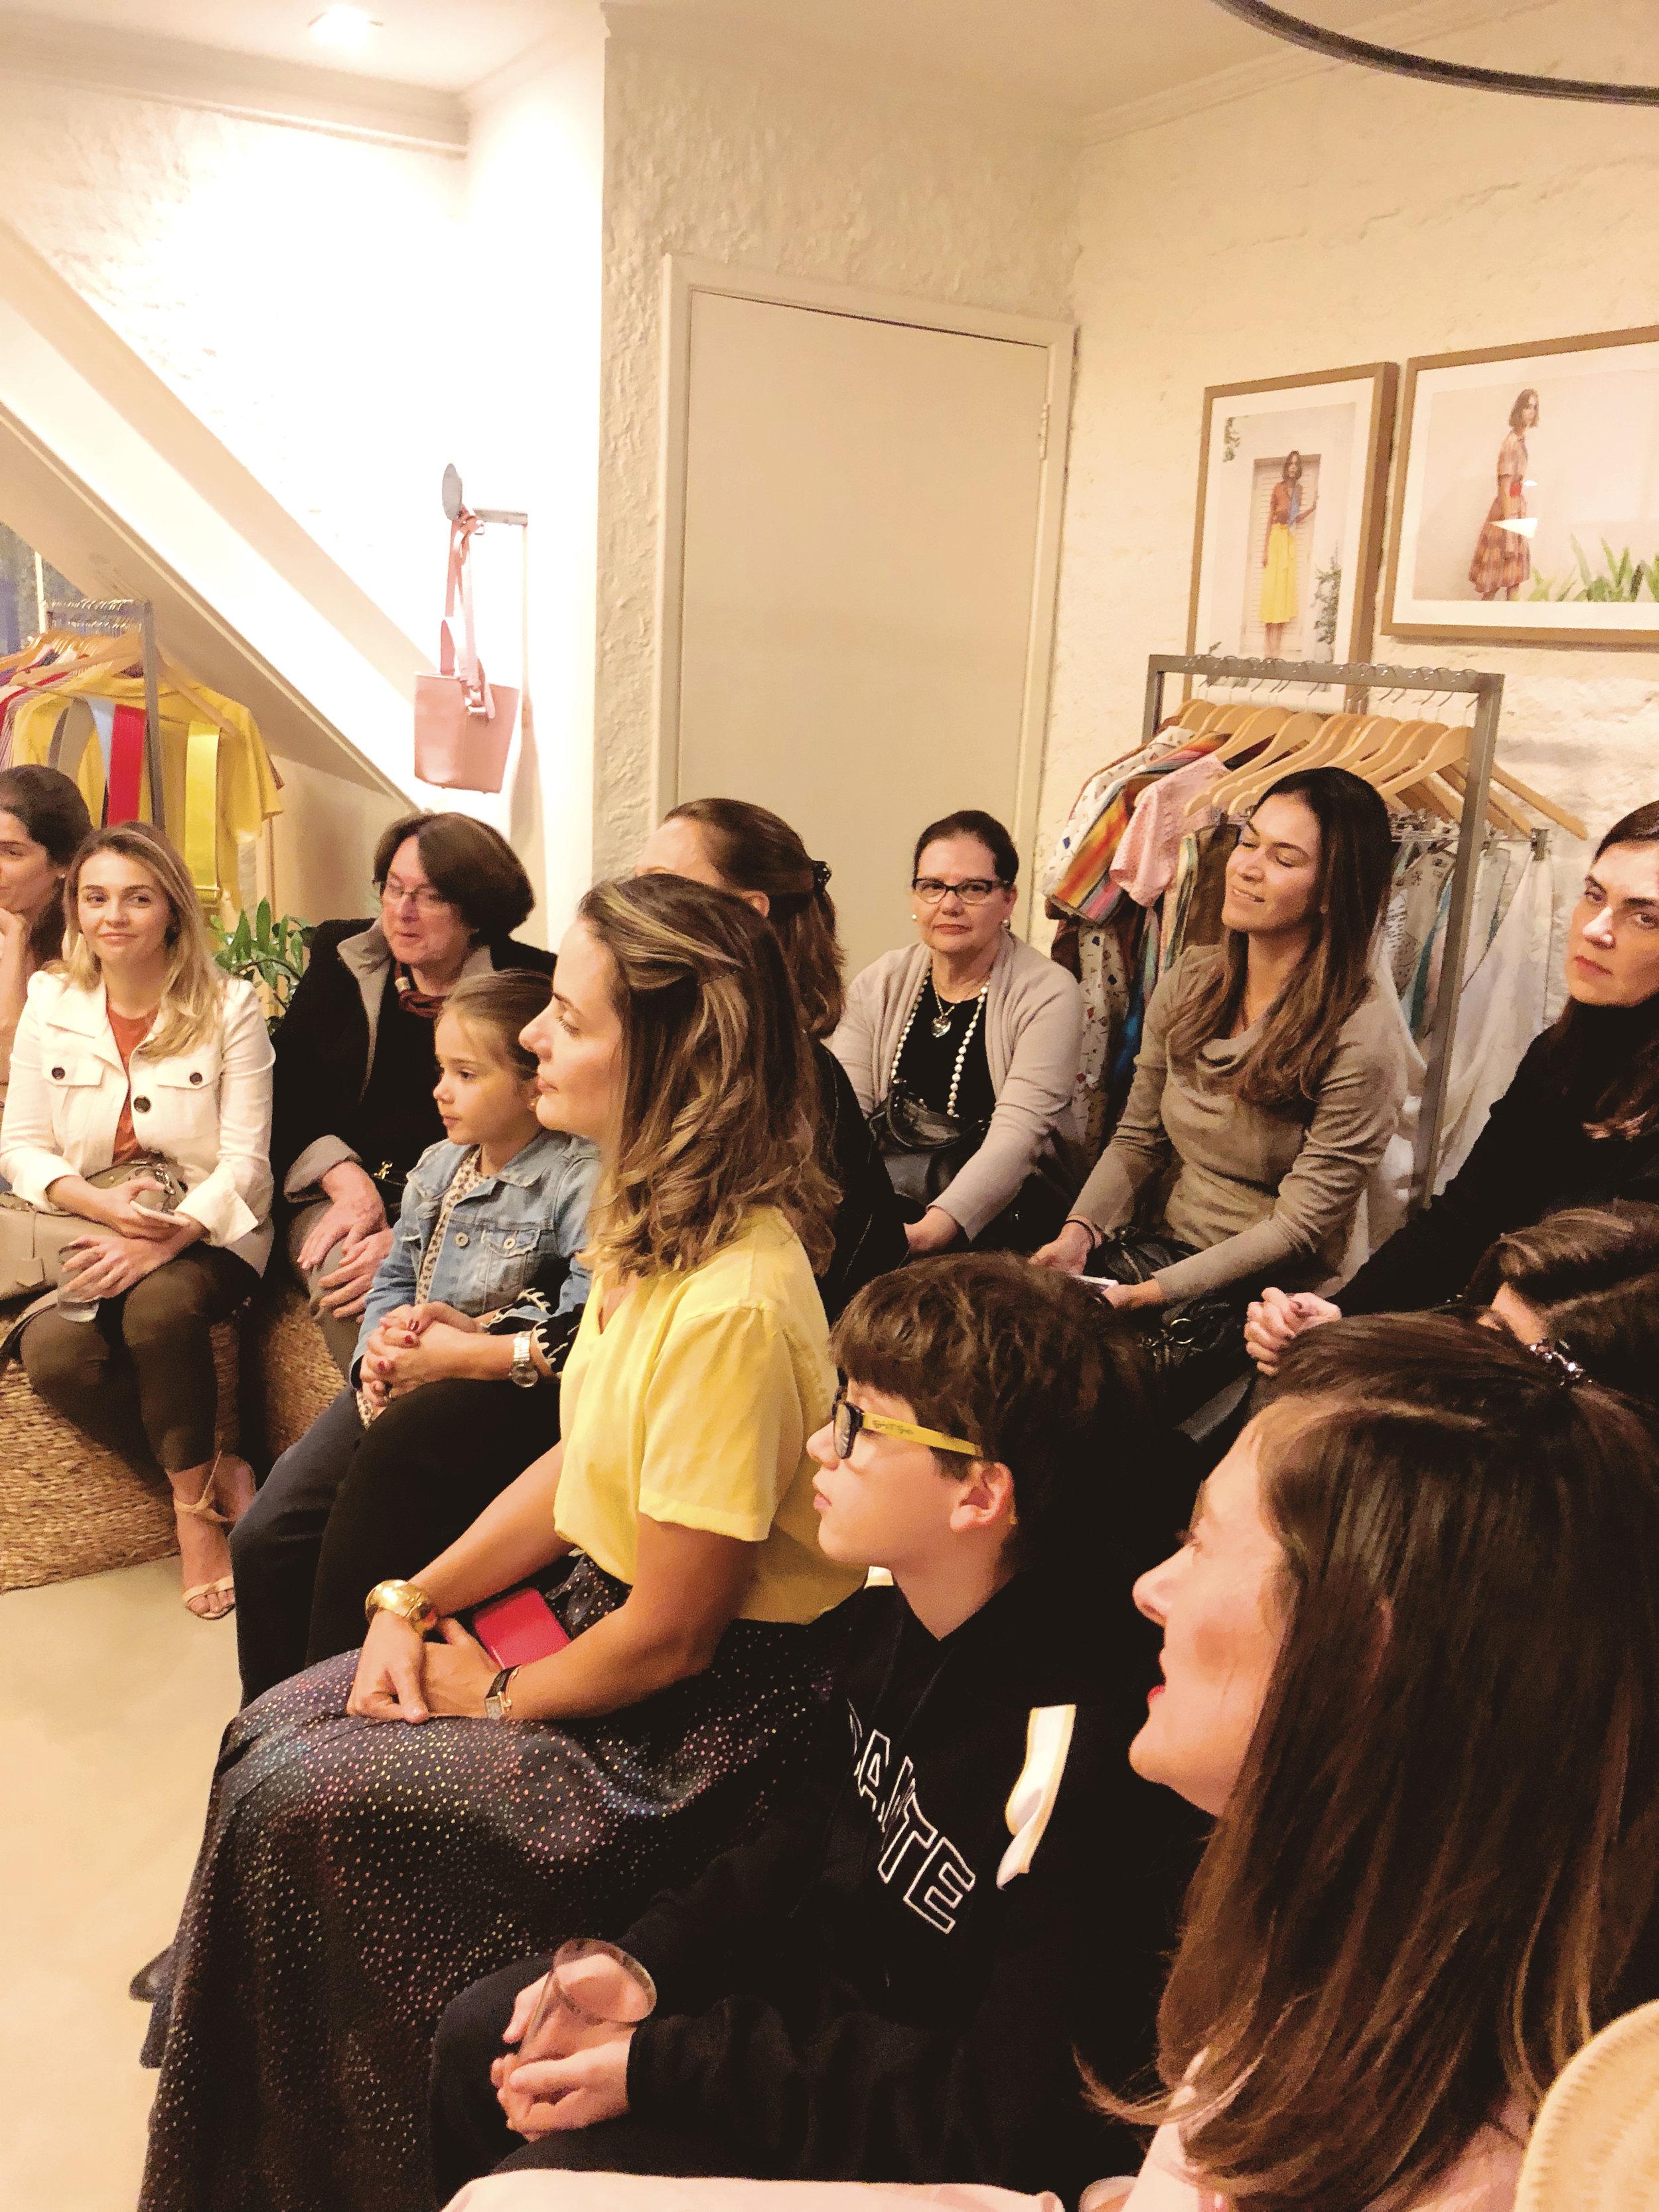 lolla talks casa 190 - Lolla Talks na Casa 190, Os Melhores Momentos